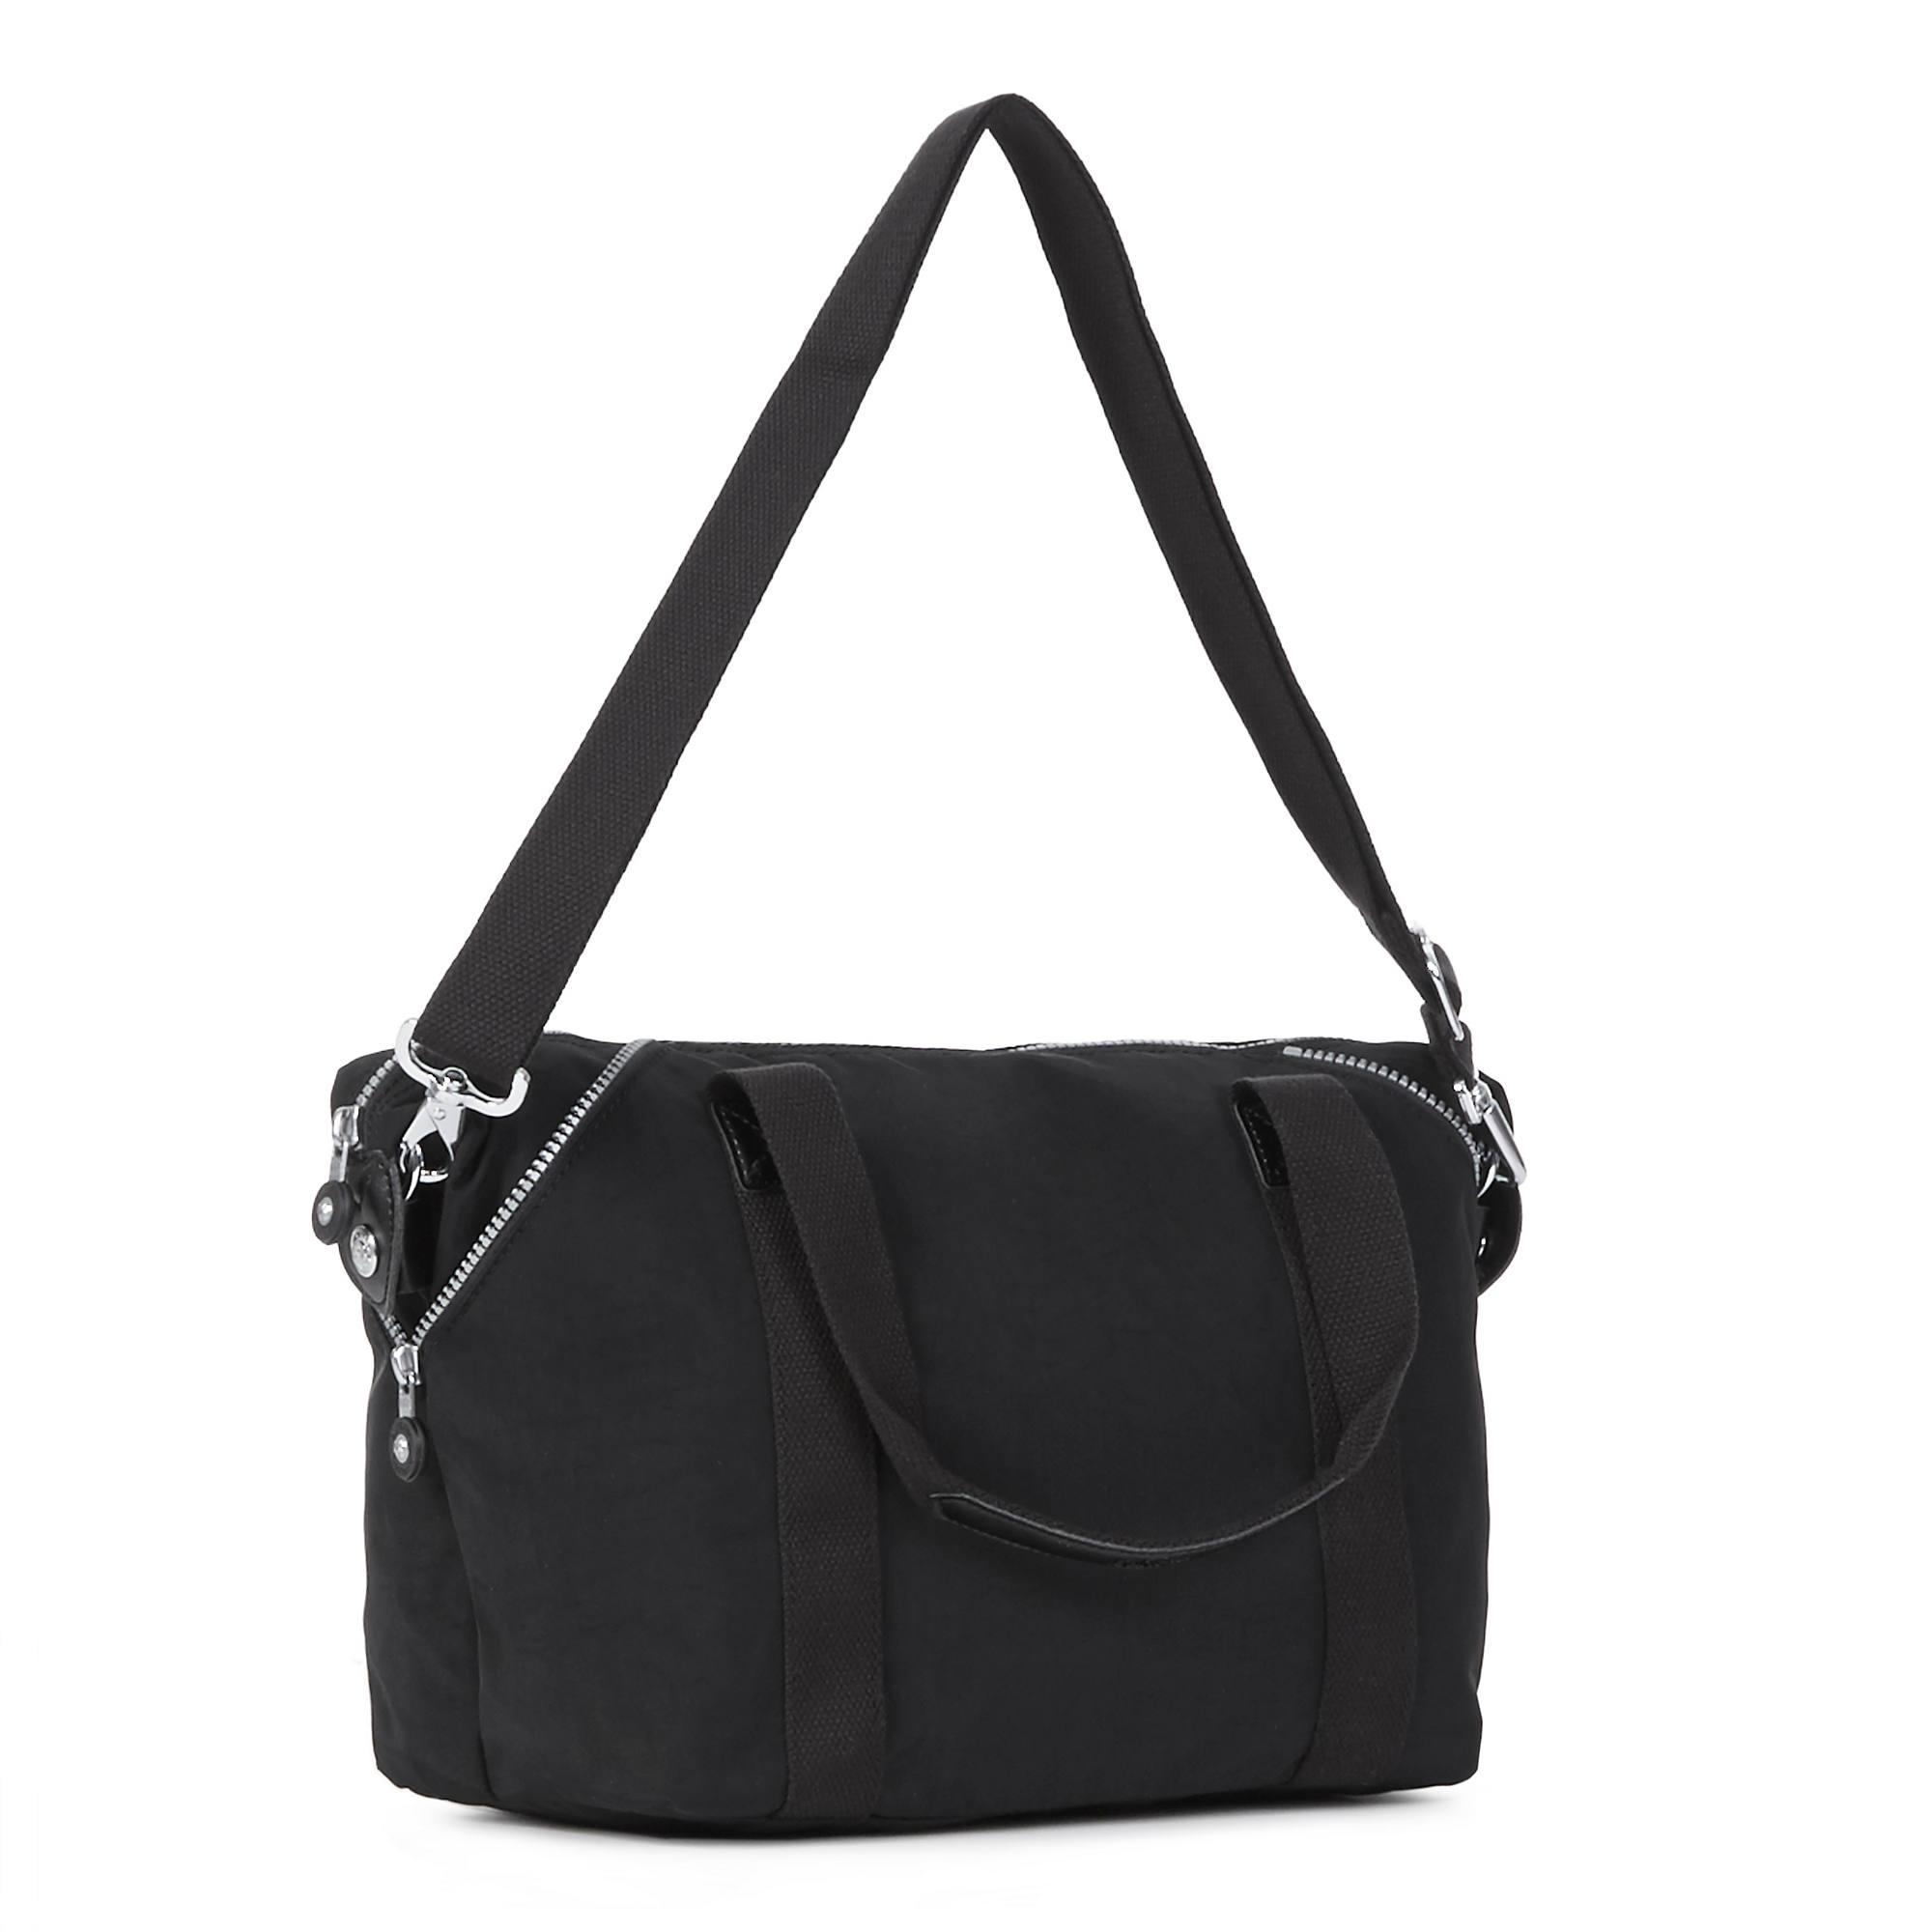 39fb86c6b7 Art Small Handbag